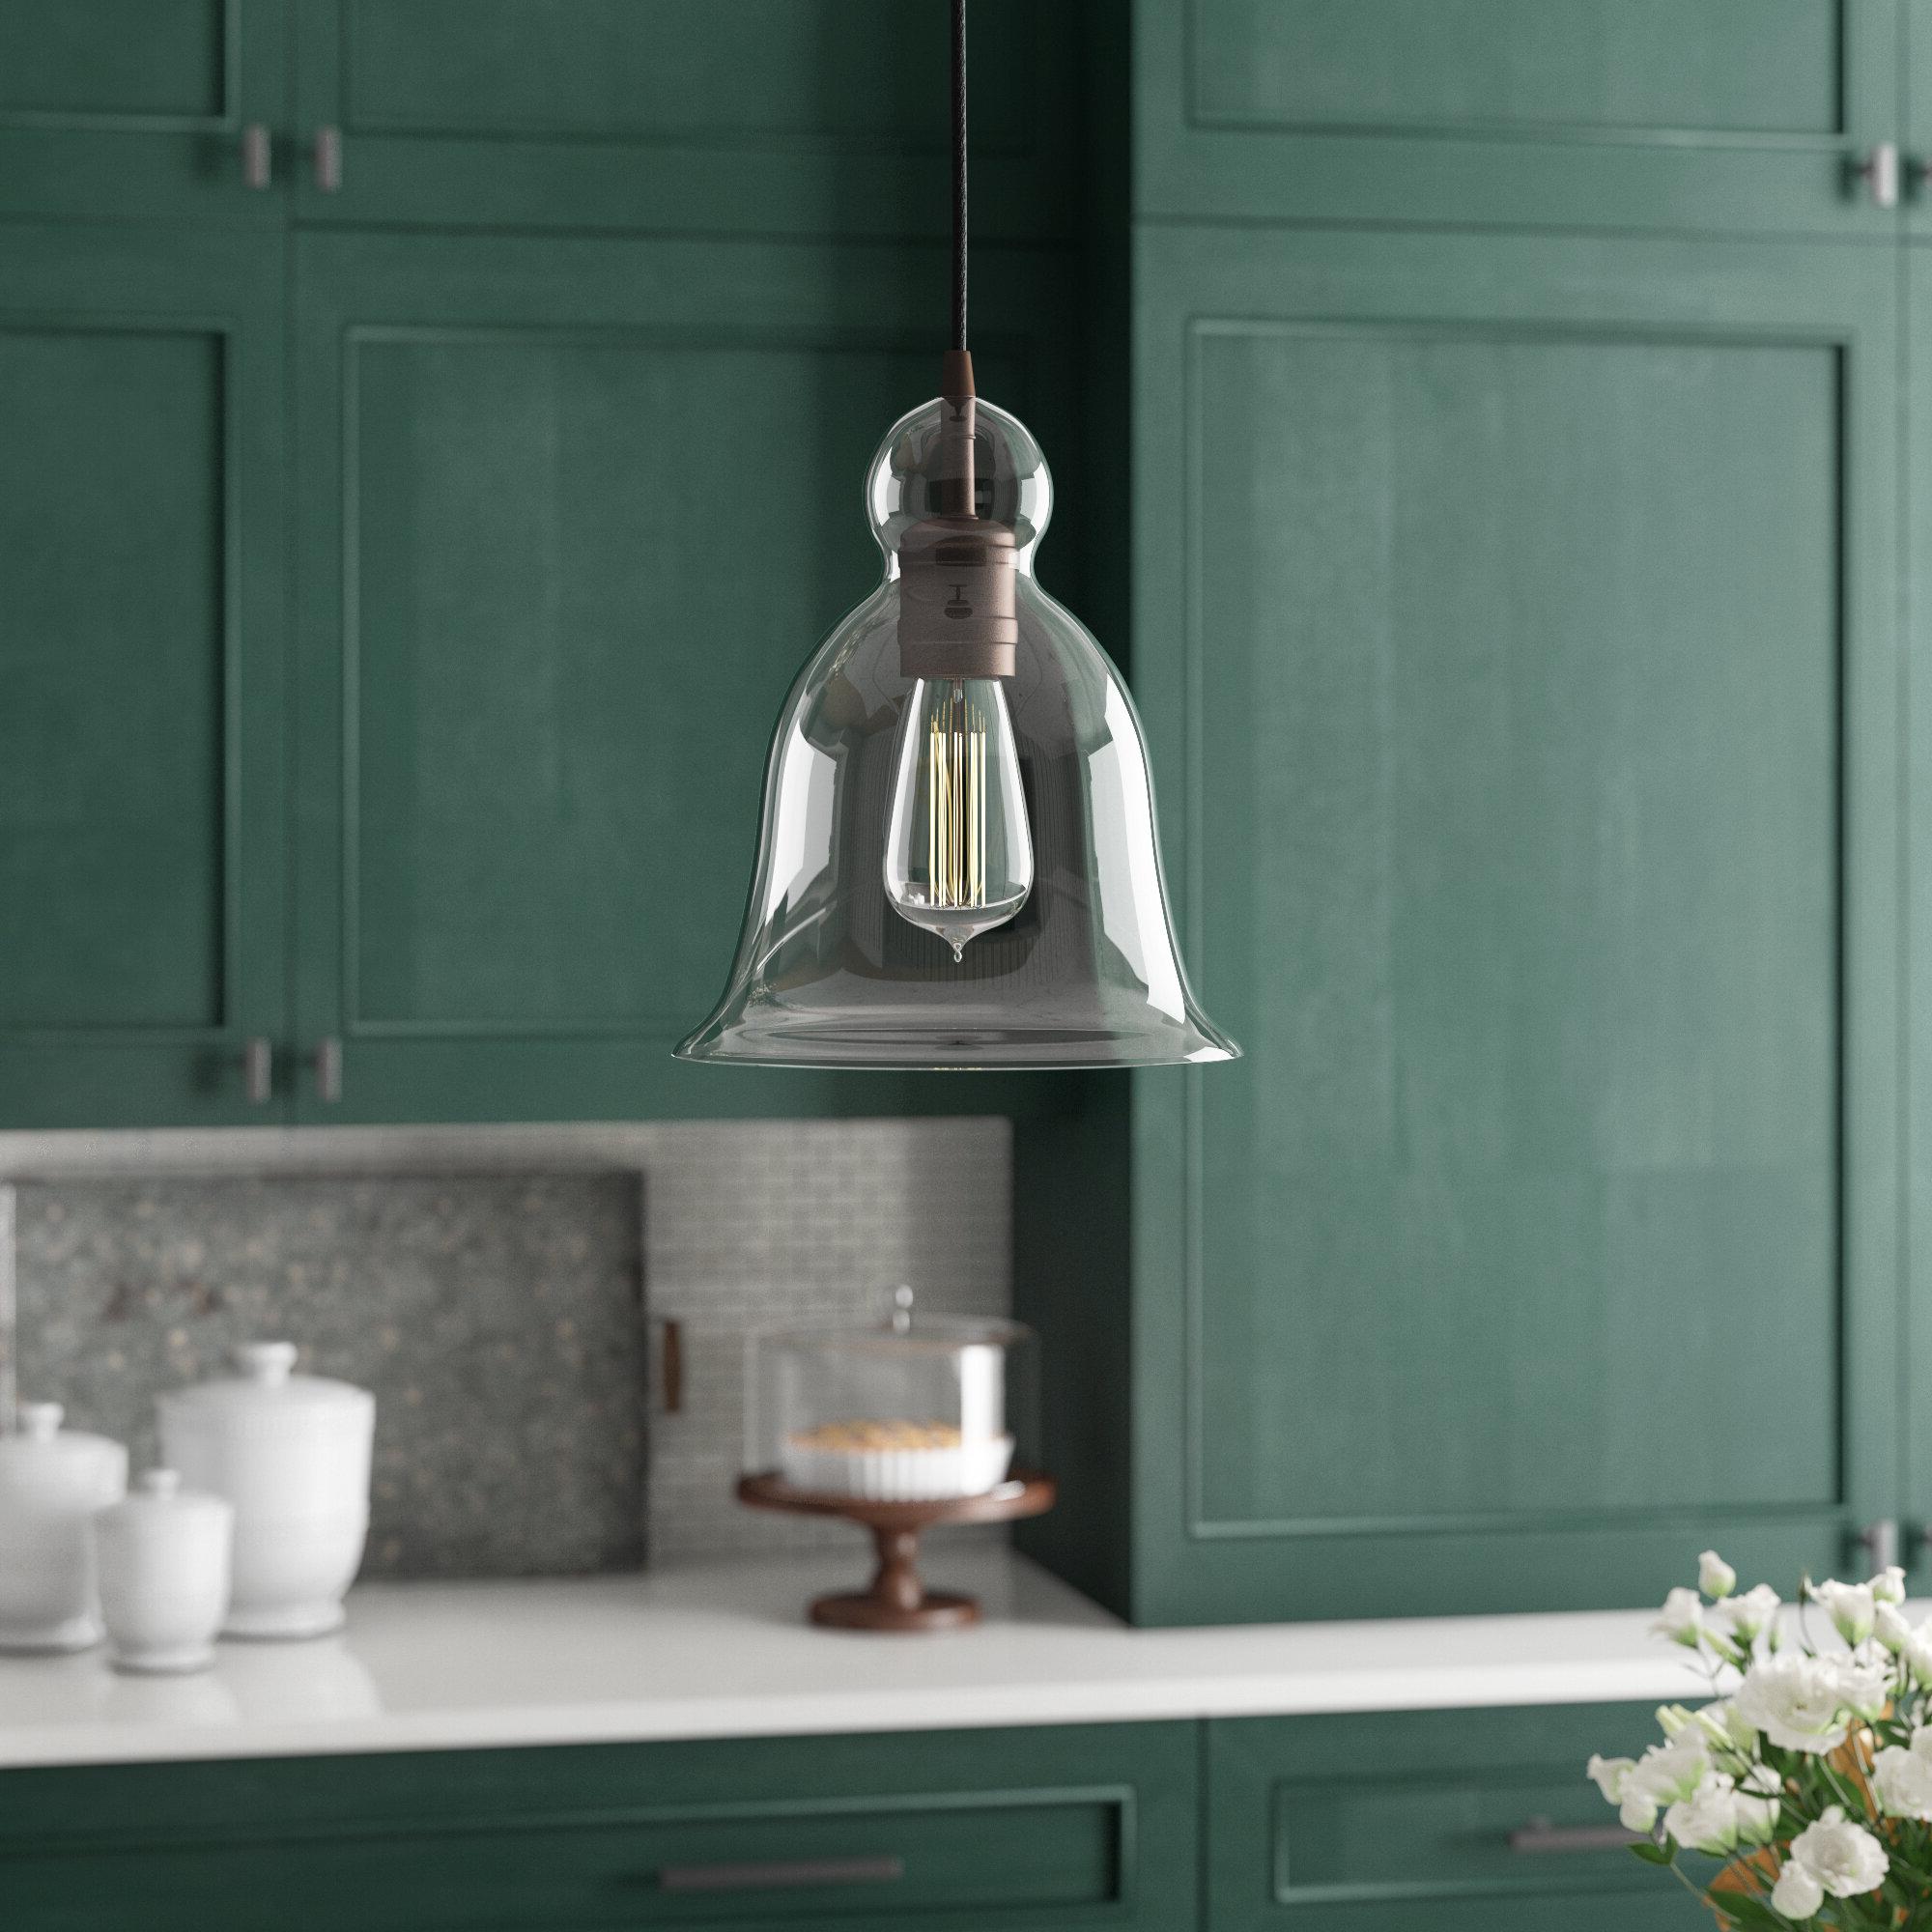 1-Light Single Bell Pendants intended for Newest 1-Light Single Bell Pendant